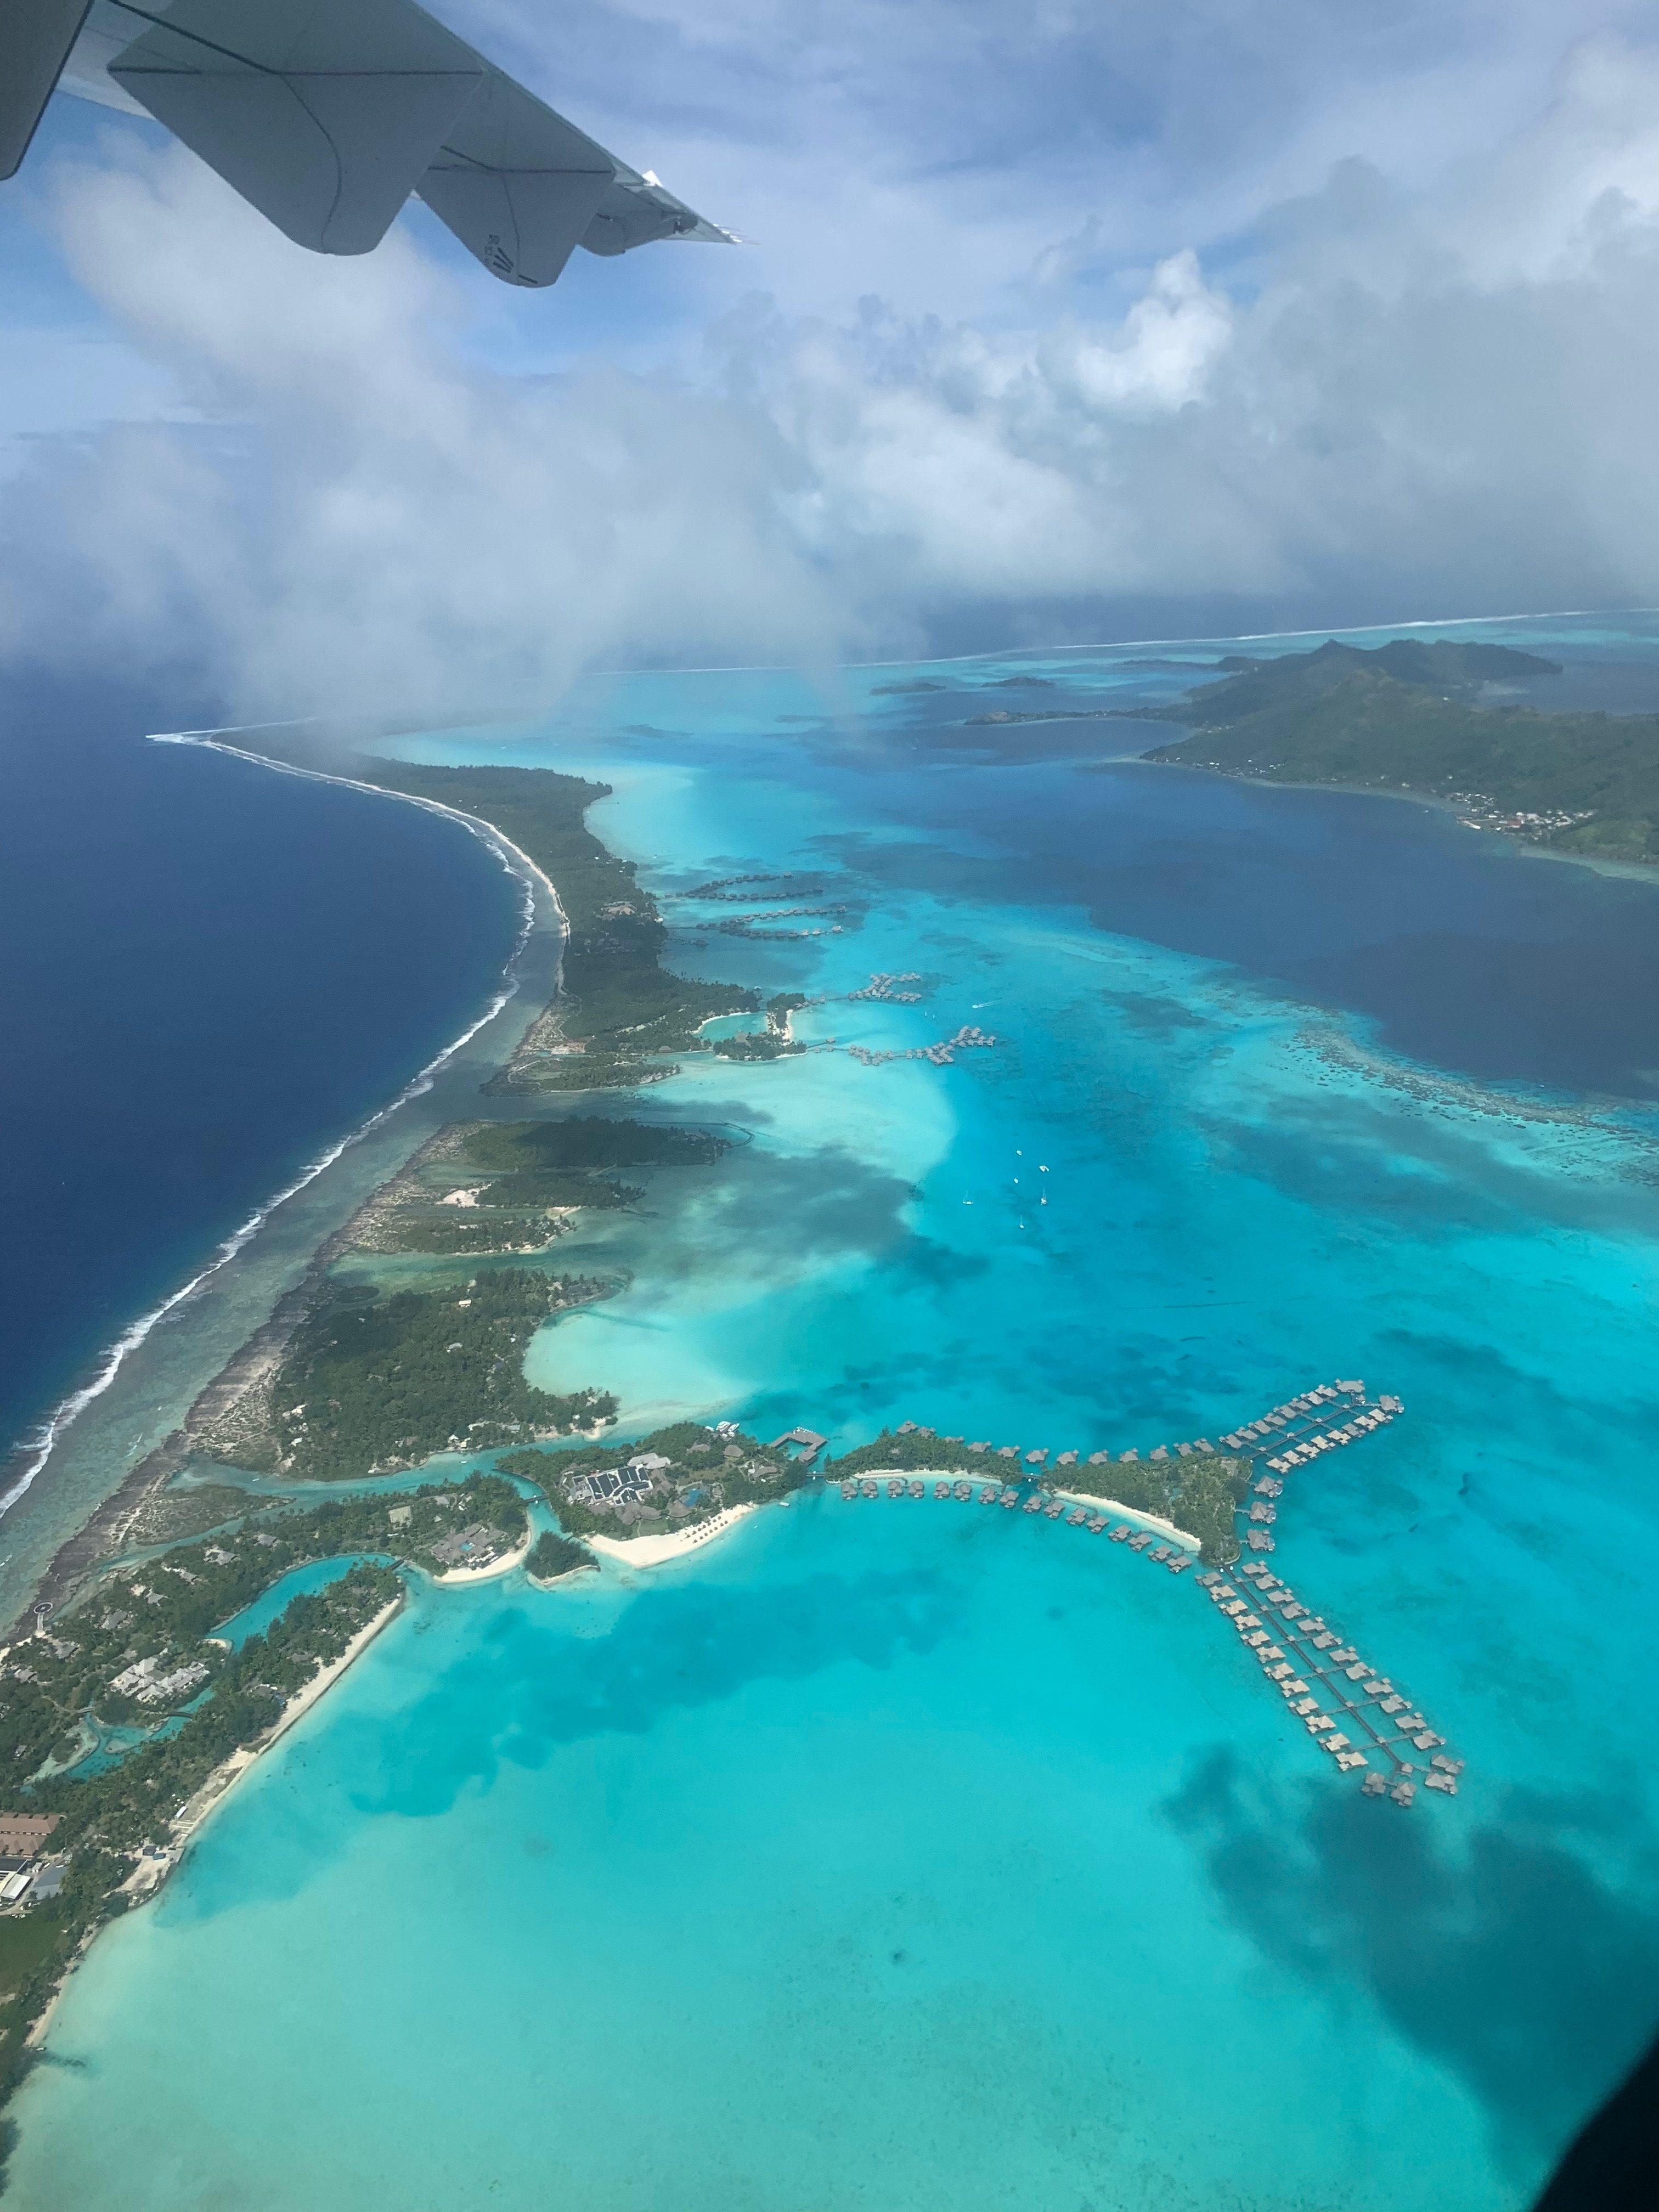 View of Bora Bora resorts from Air Tahiti plane